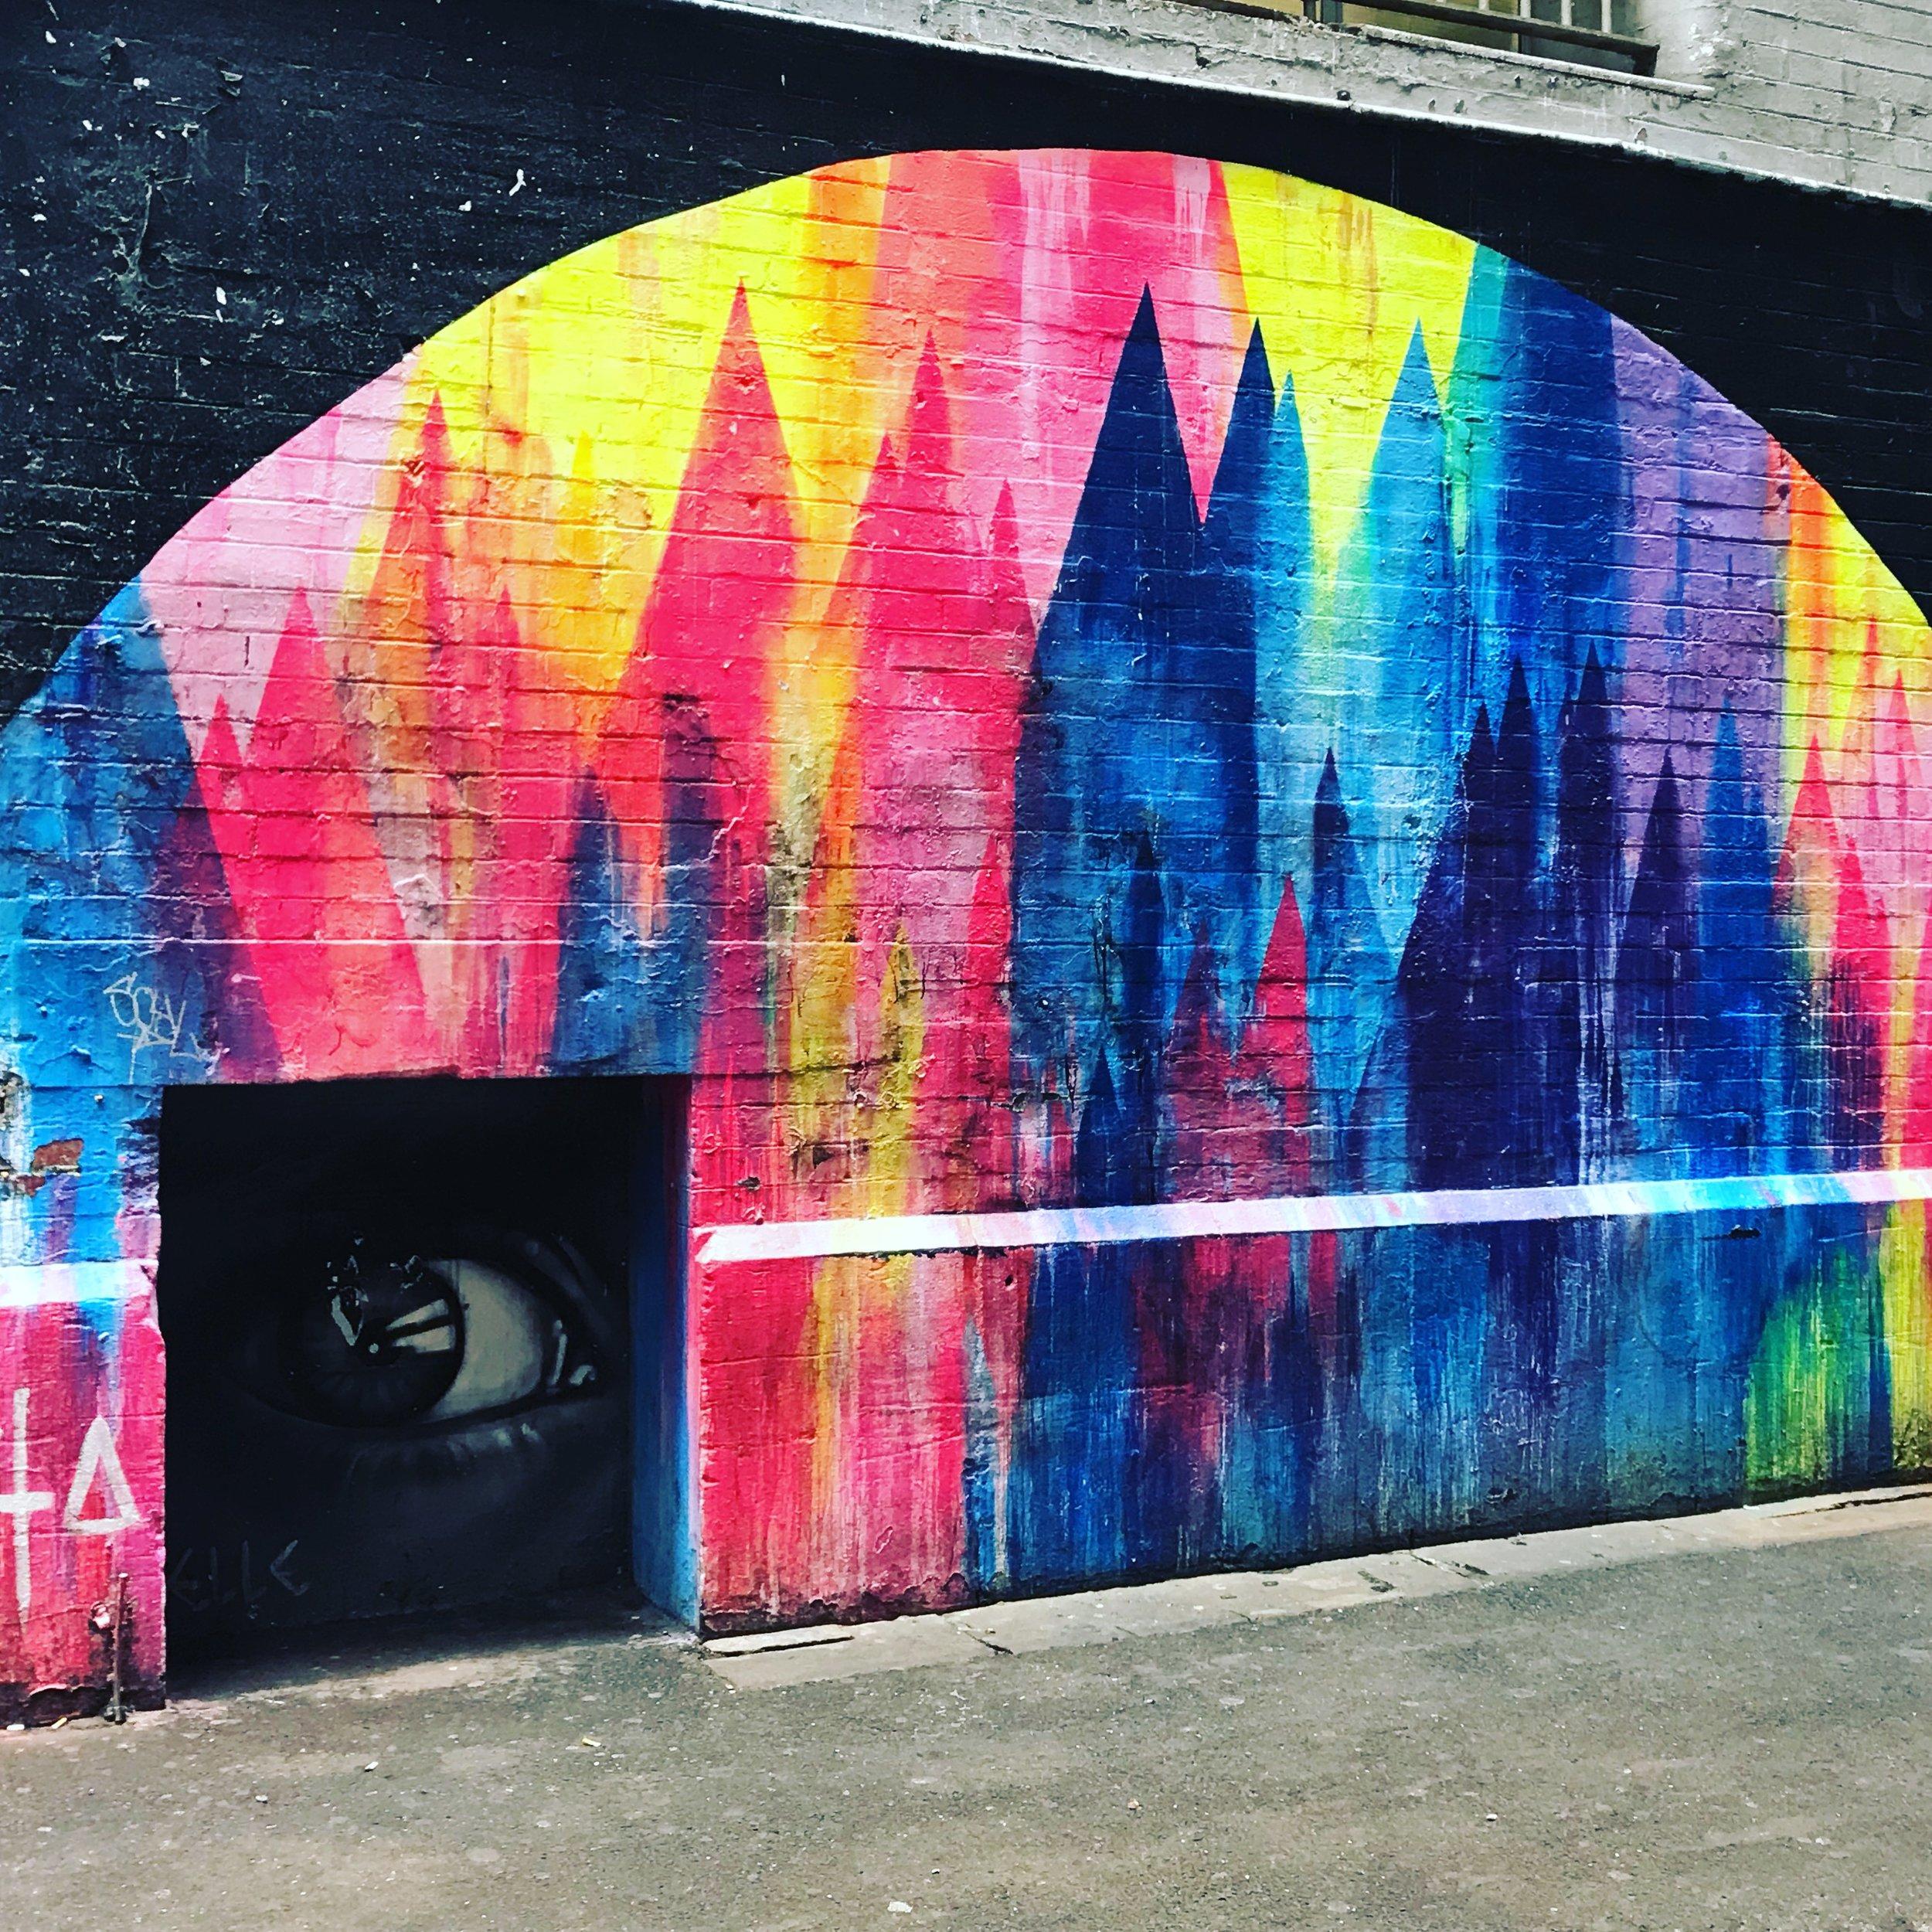 melbourne-art-street-graffiti-australia